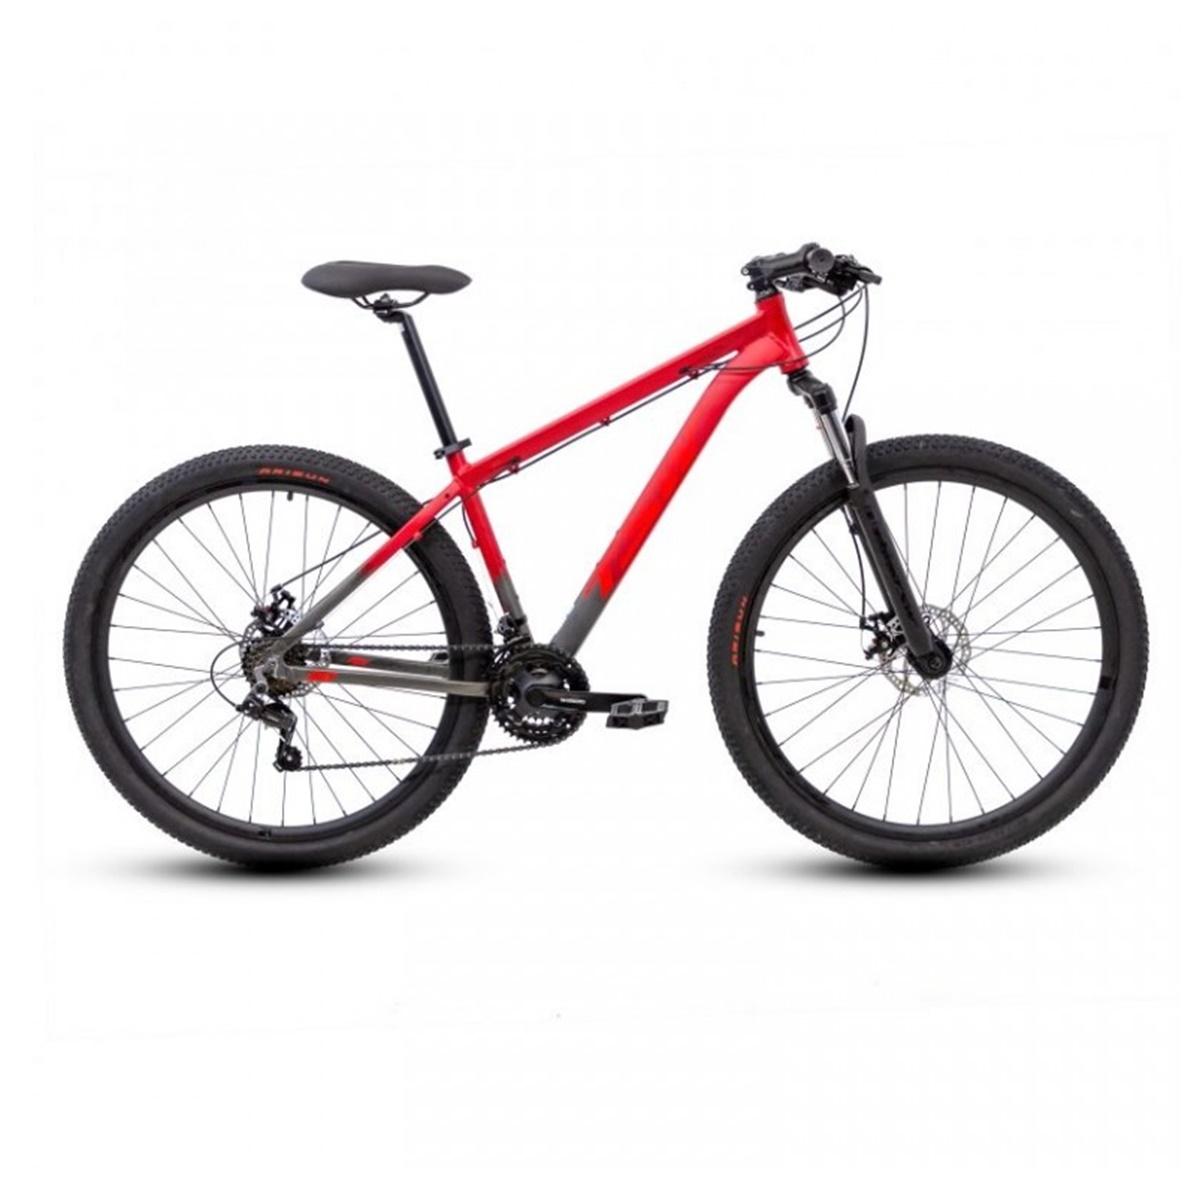 Bicicleta Aro 29 Tsw Ride 21 Velocidades Shimano 2021/2022